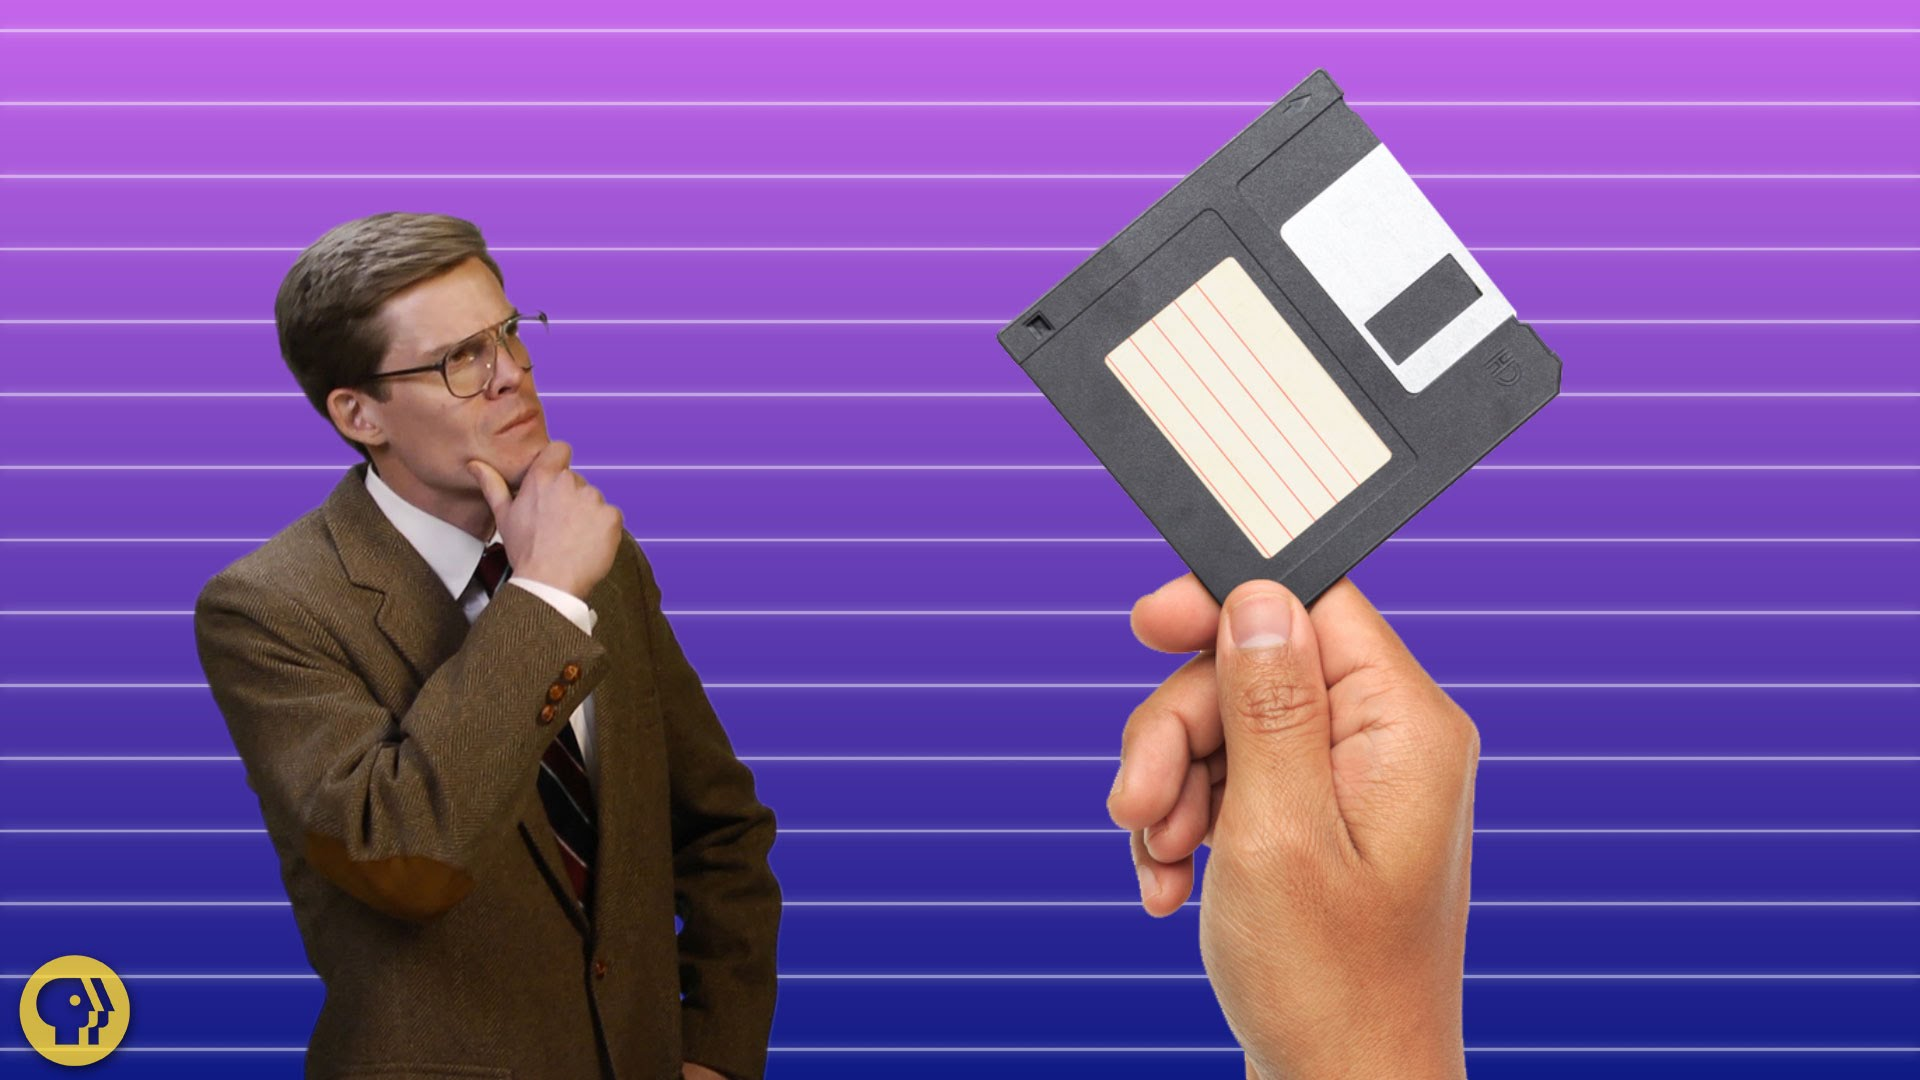 Is Big Data Getting Too Big?